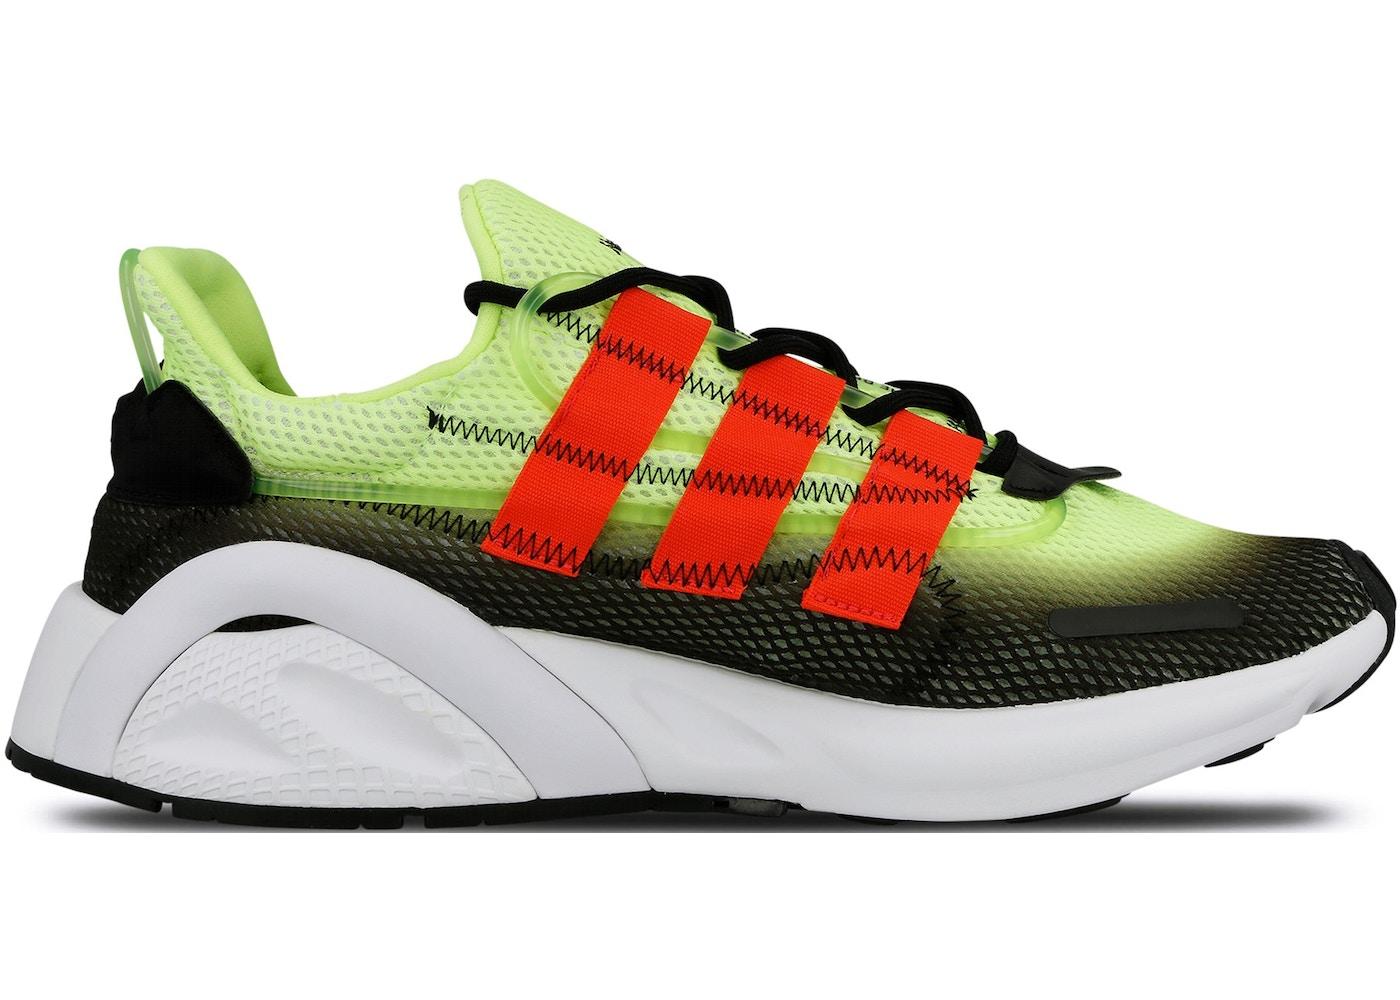 45cbc482 adidas Size 4 Shoes - Lowest Ask